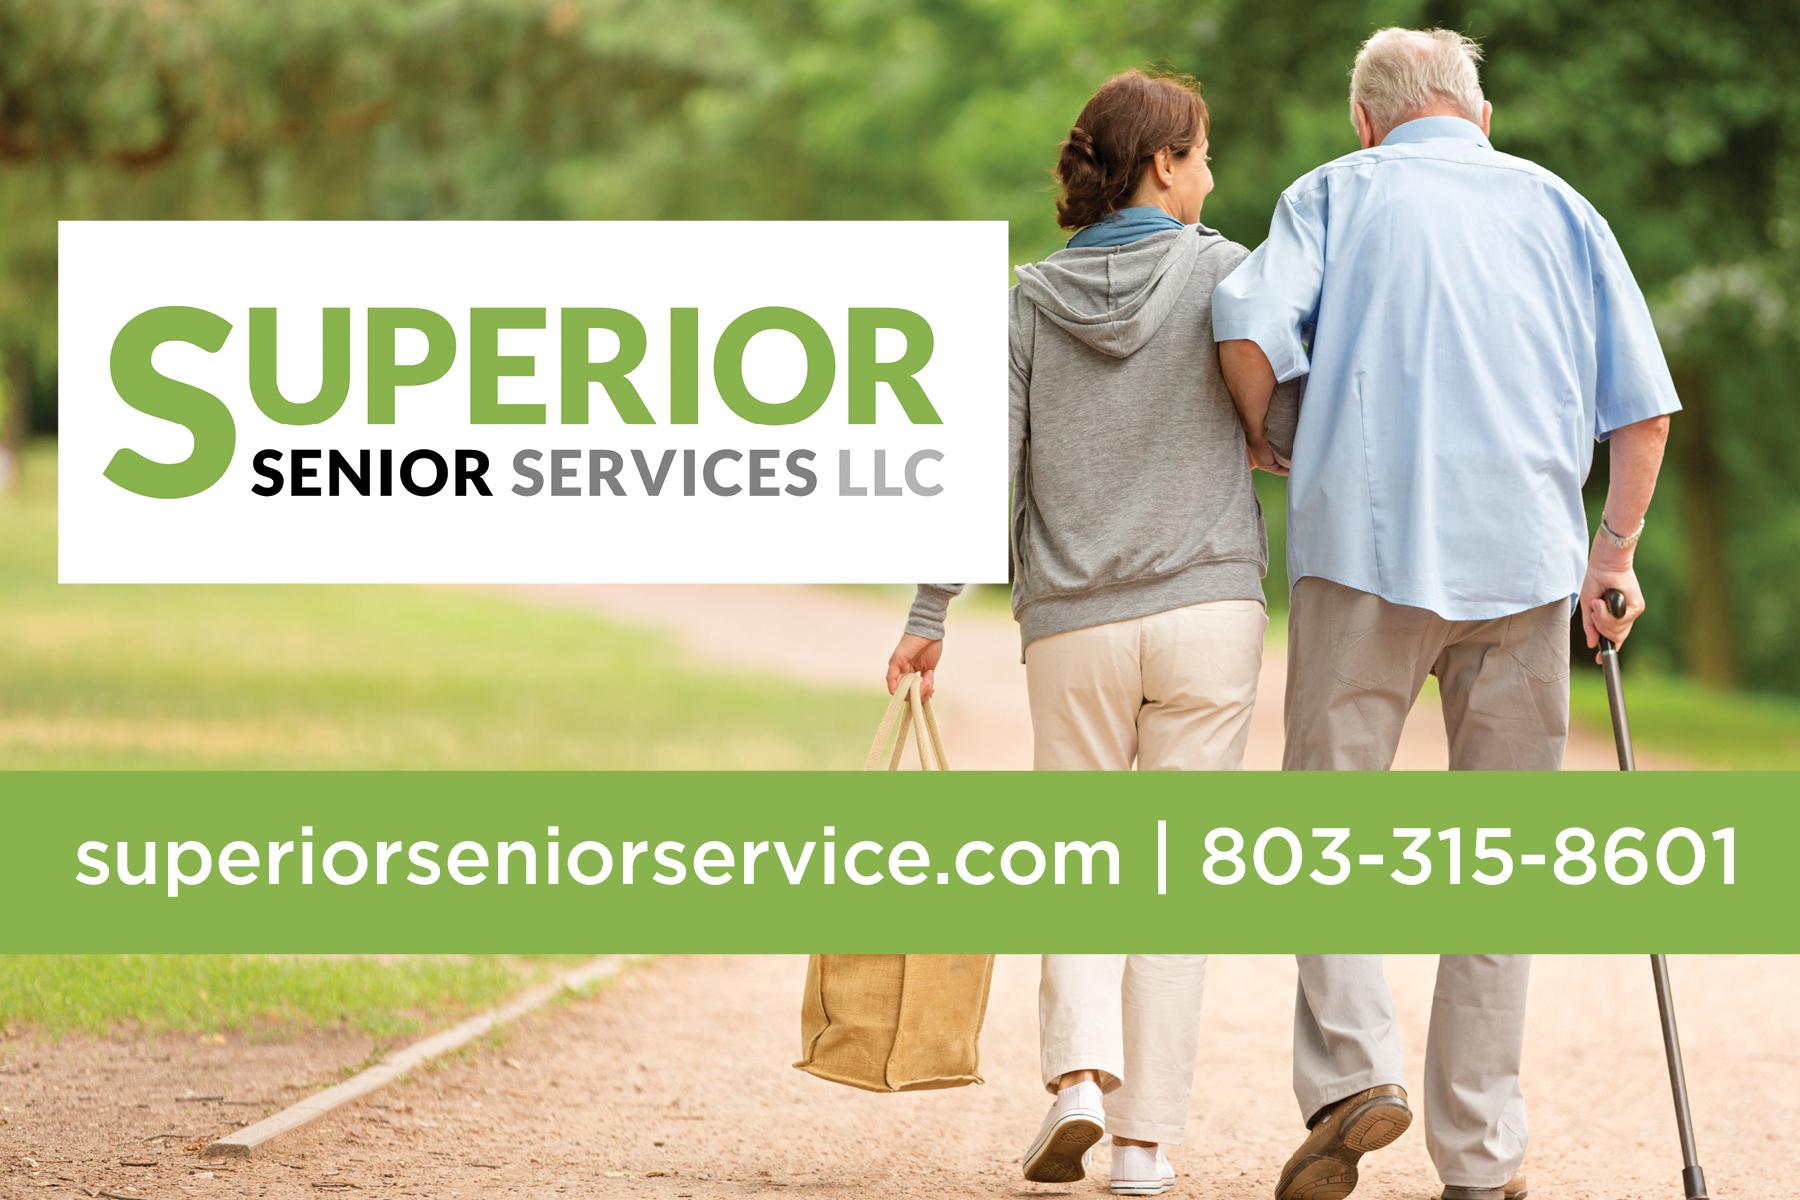 Services - Superior Senior Services.jpg